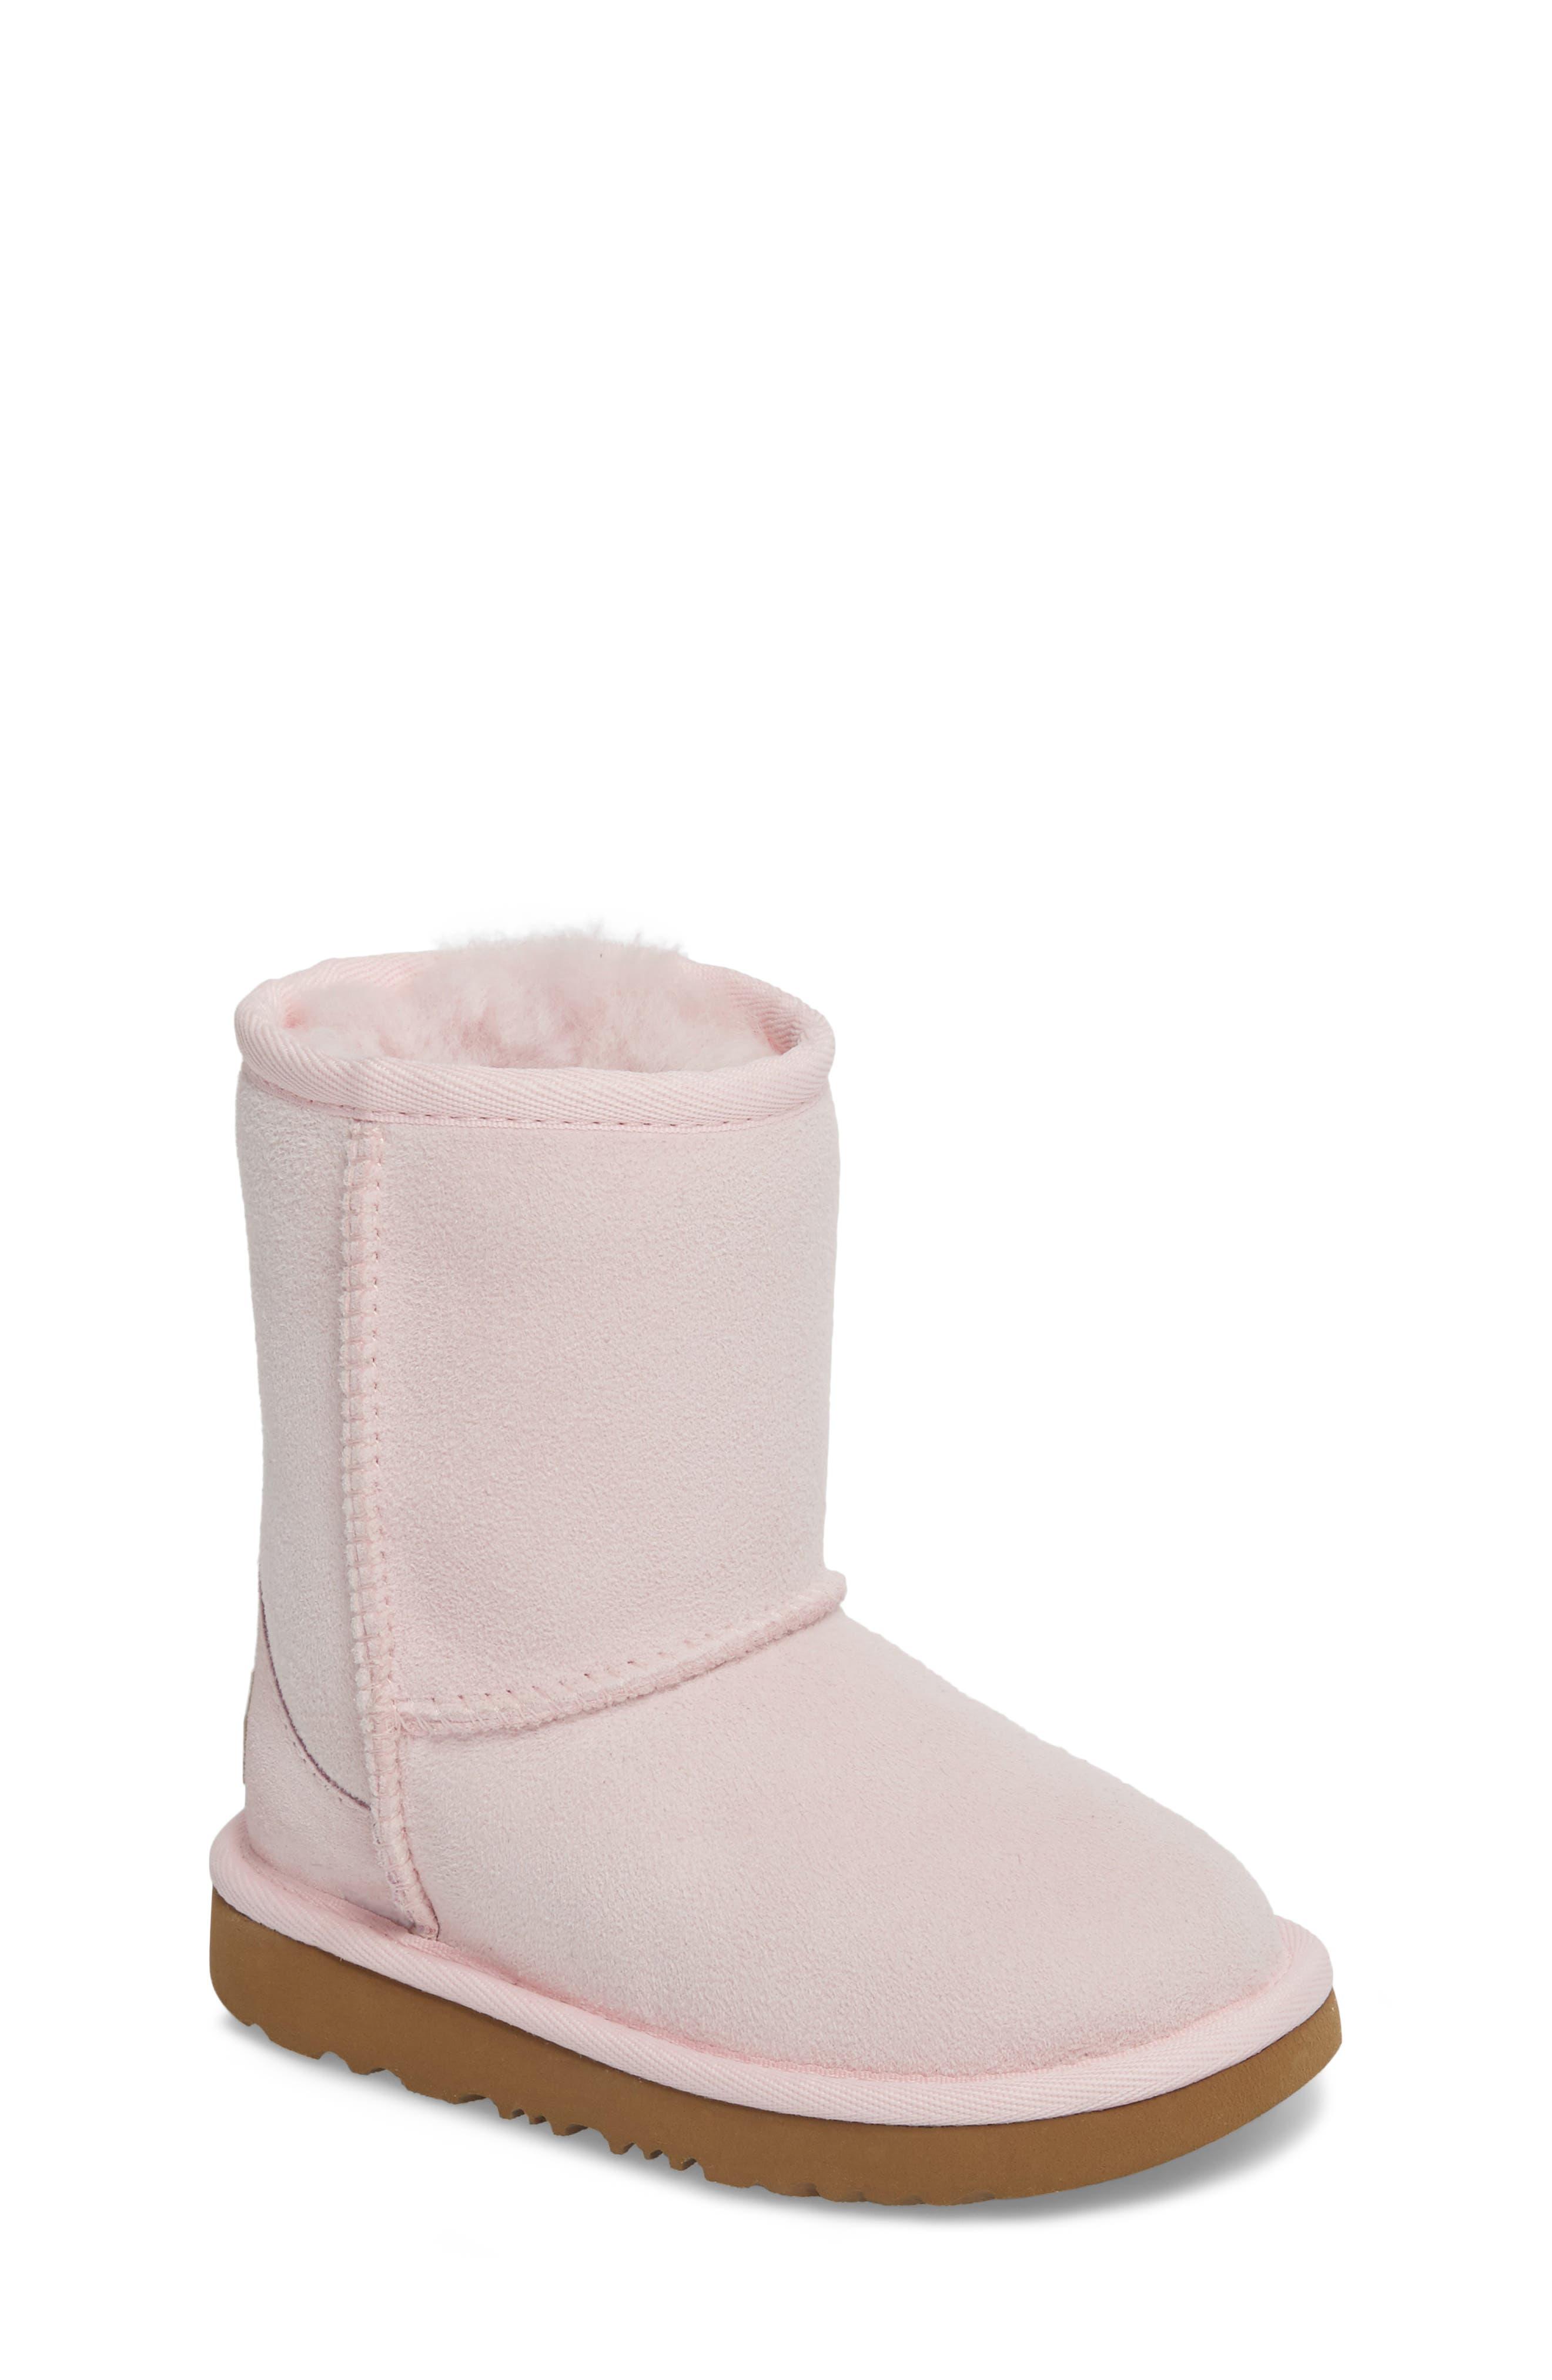 Alternate Image 1 Selected - UGG® Classic II Water Resistant Genuine Shearling Boot (Walker, Toddler, Little Kid & Big Kid)